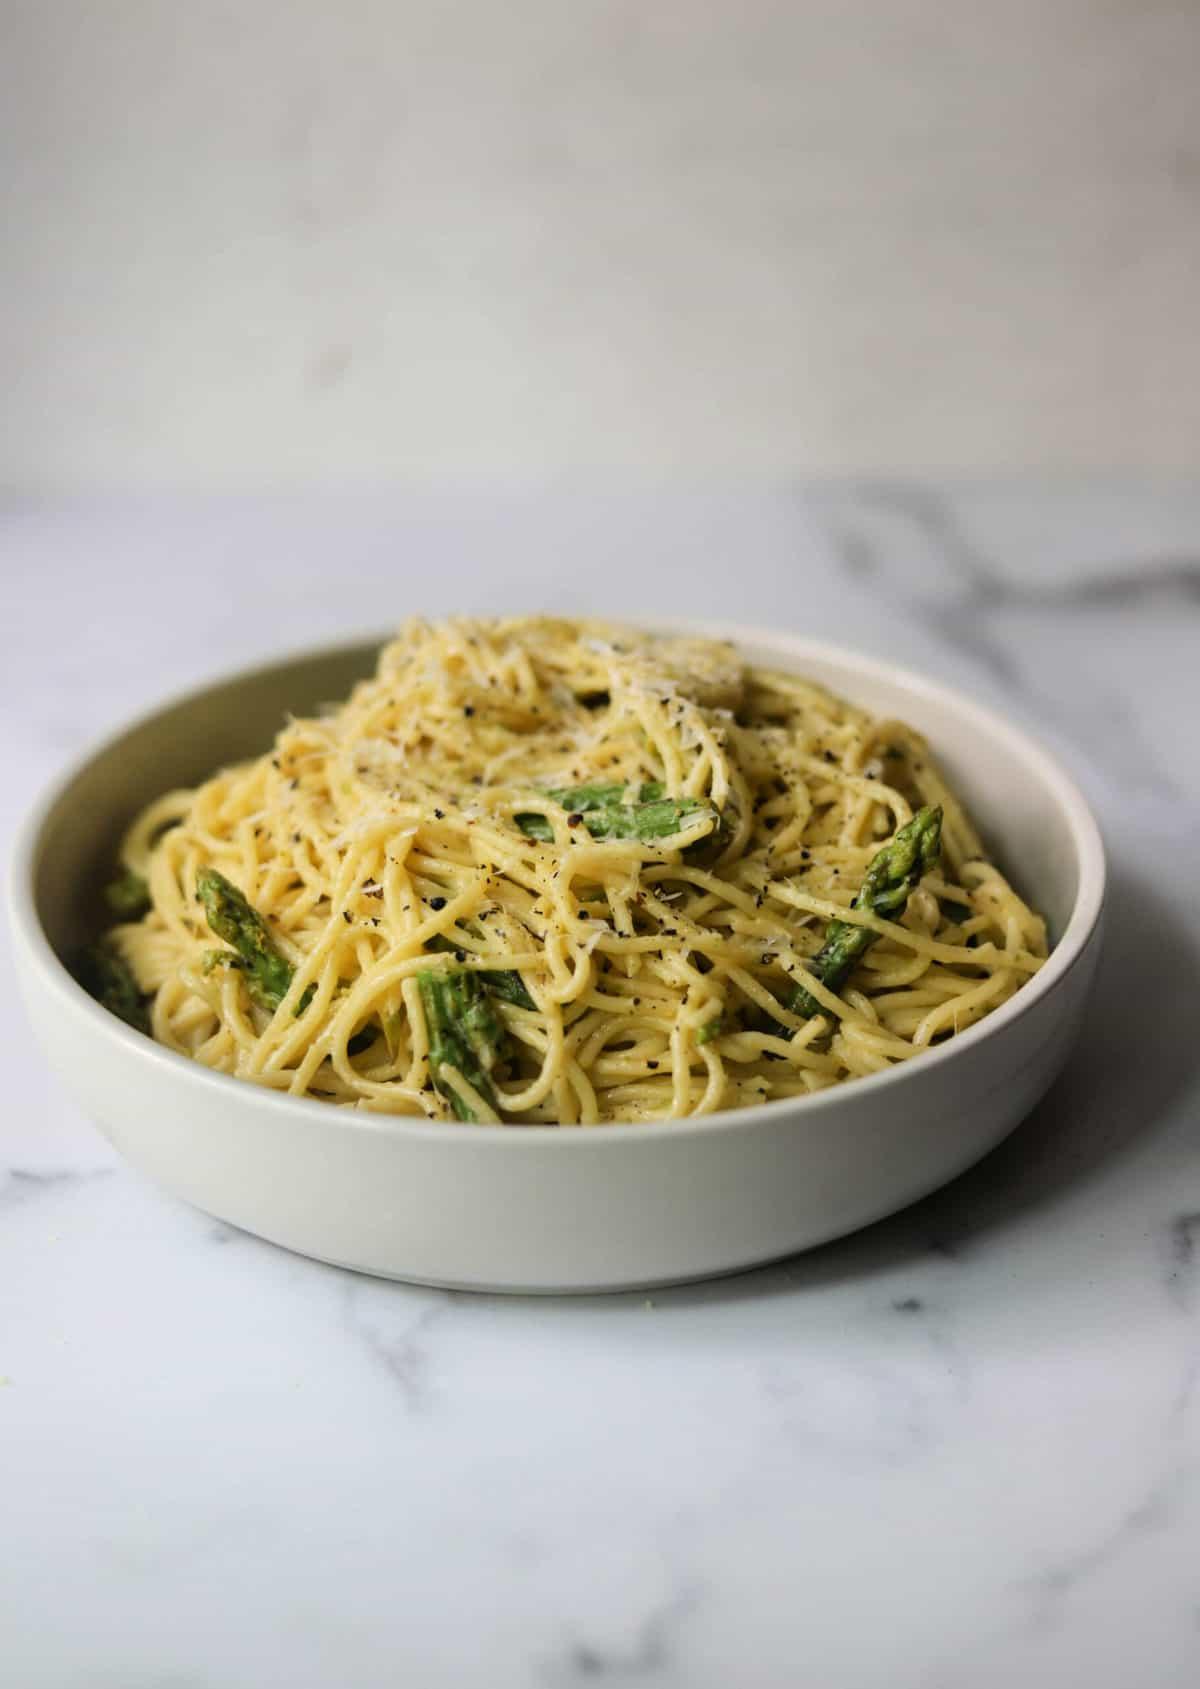 A white bowl with lemon asparagus pasta.